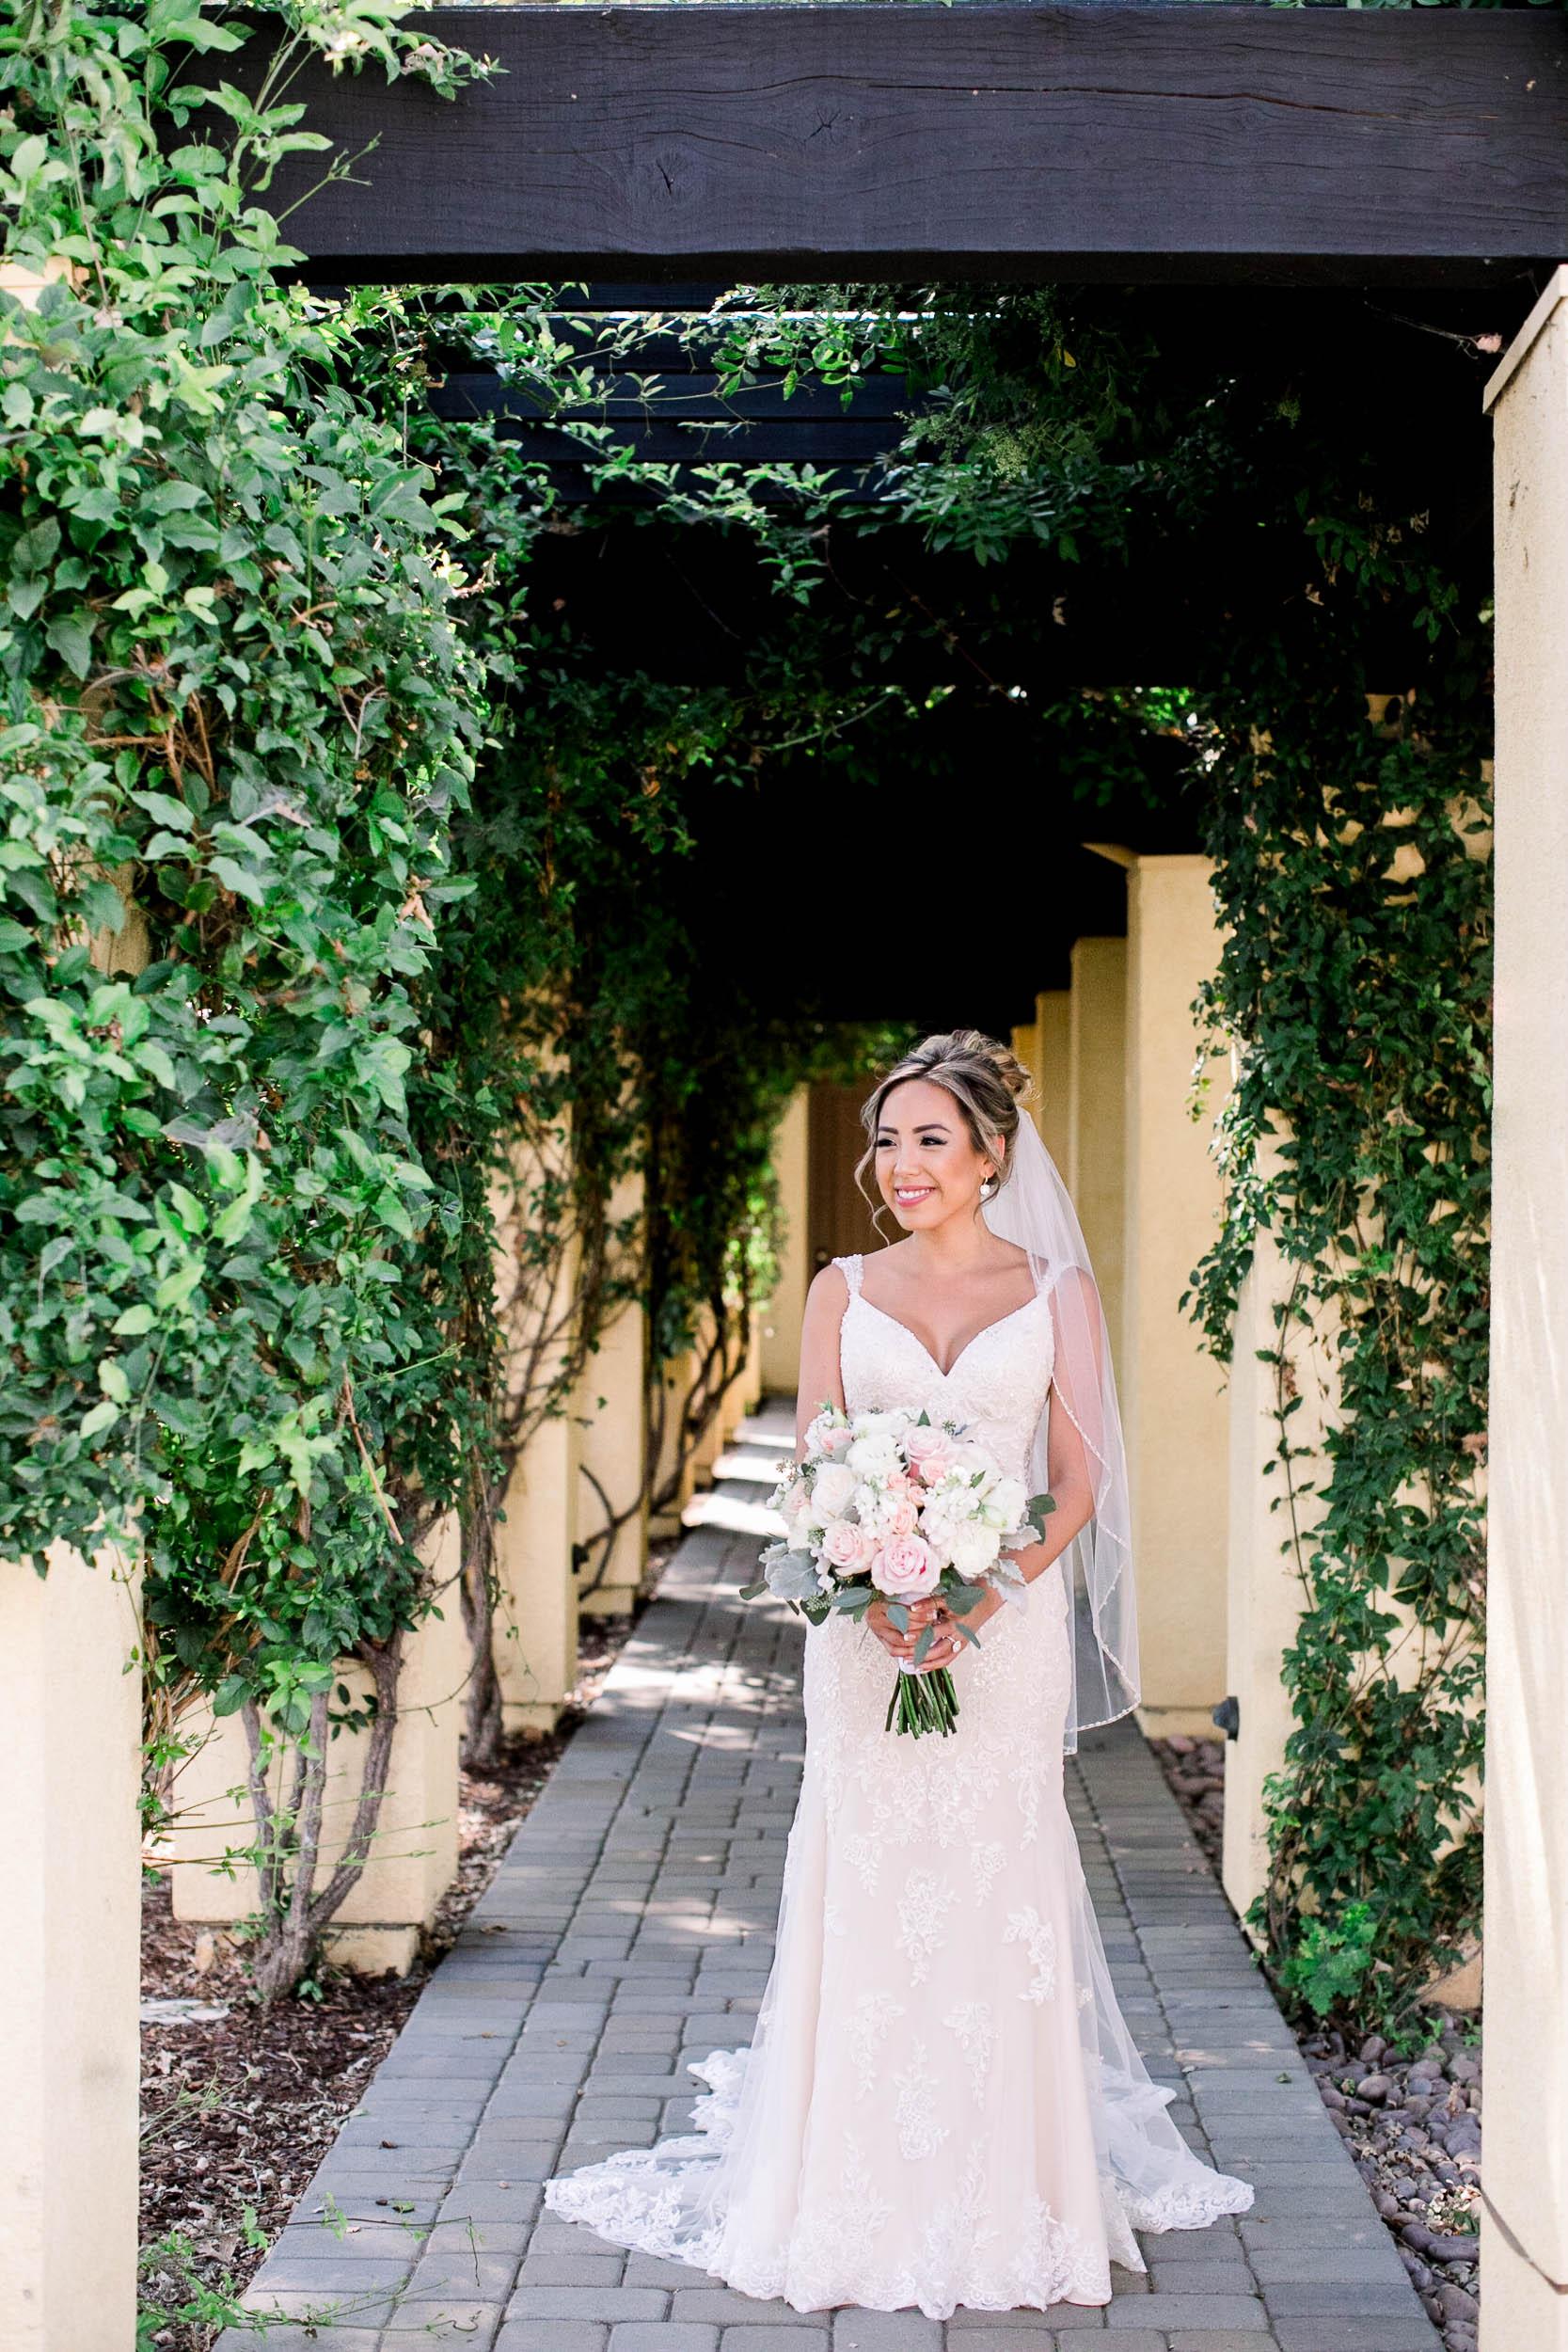 Las Positas Wedding_Buena Lane Photography_090118ER170.jpg